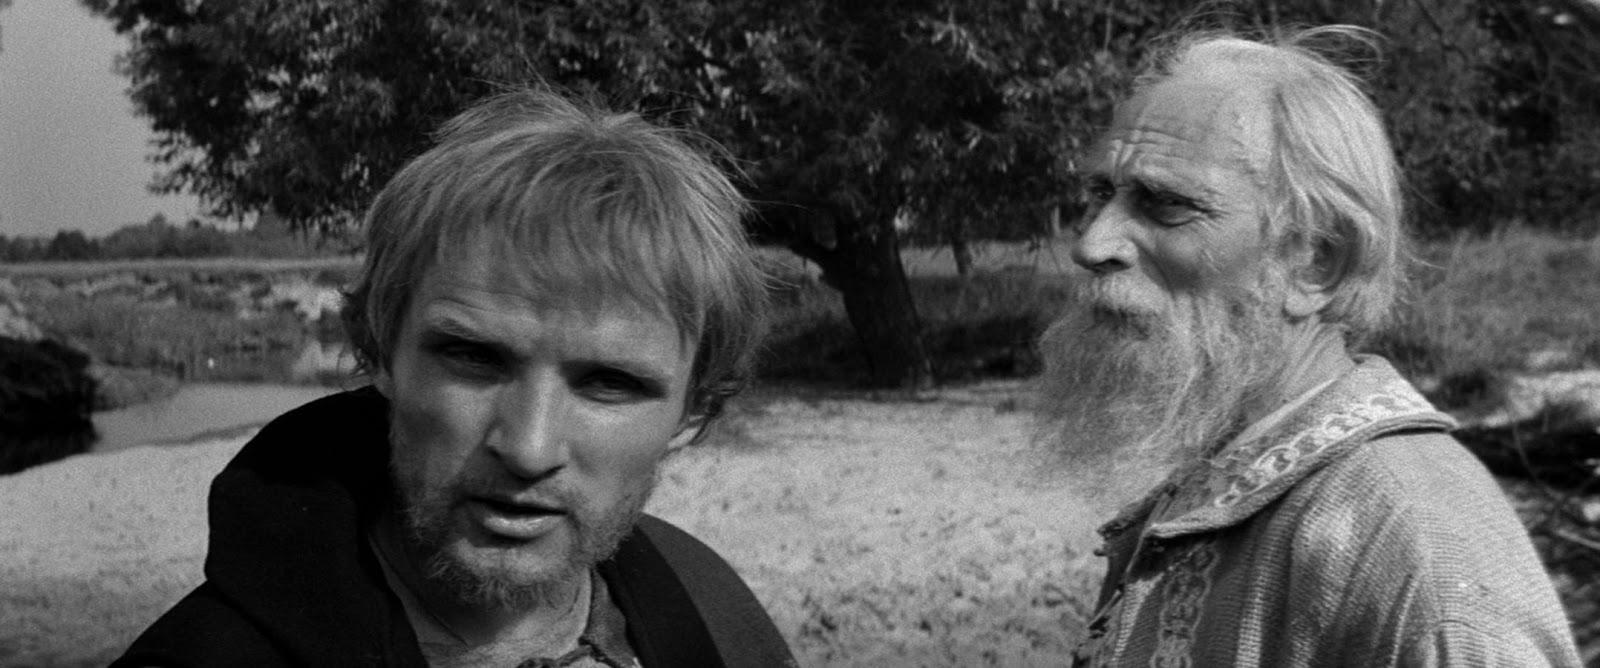 Nikolay Burlyaev: biography, personal life, filmography and interesting facts 56